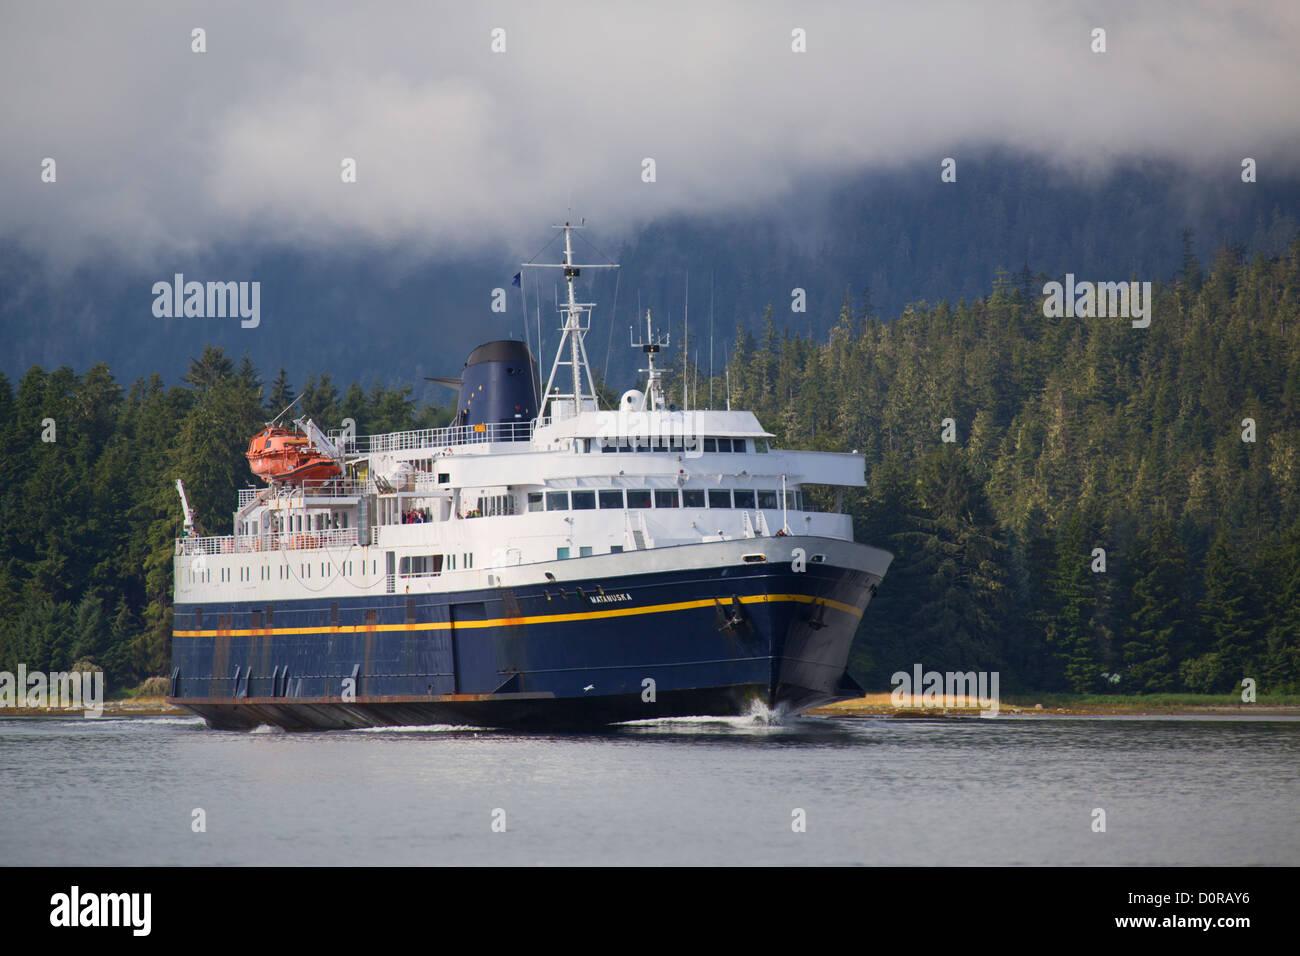 Alaska State Ferry Matanuska, Petersburg, Alaska. - Stock Image